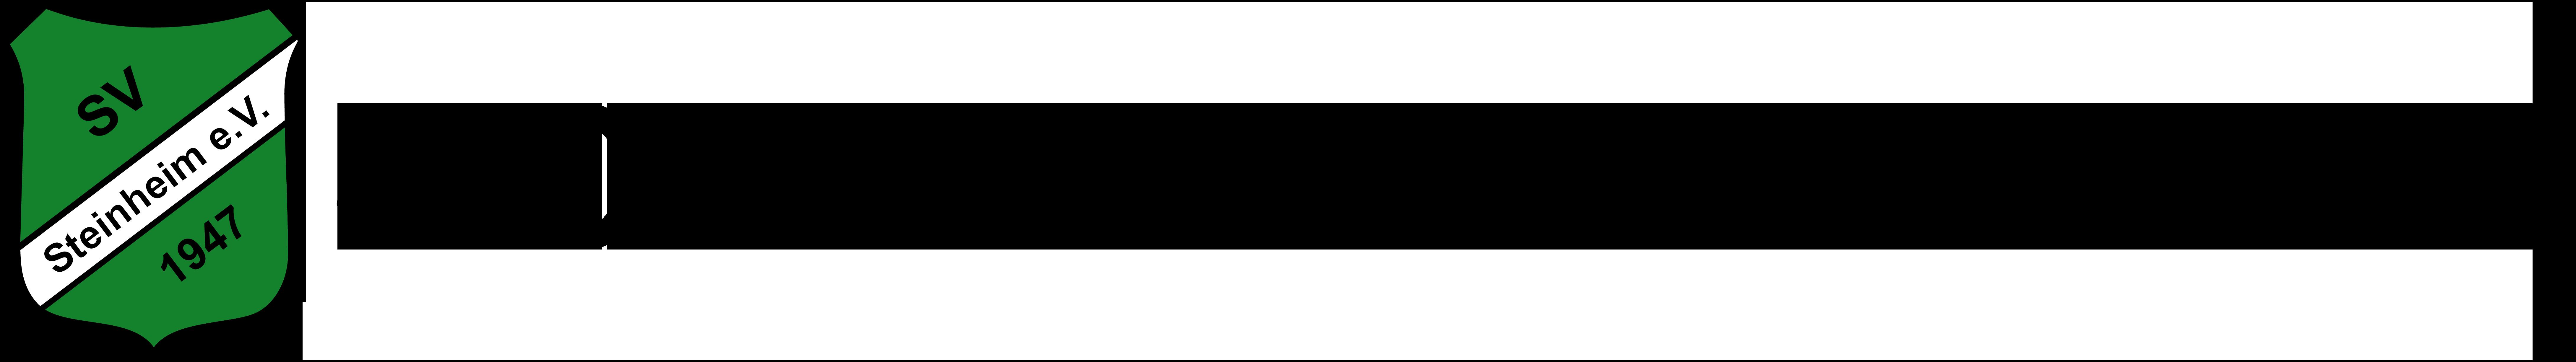 Tischtennis – SV Steinheim e.V.